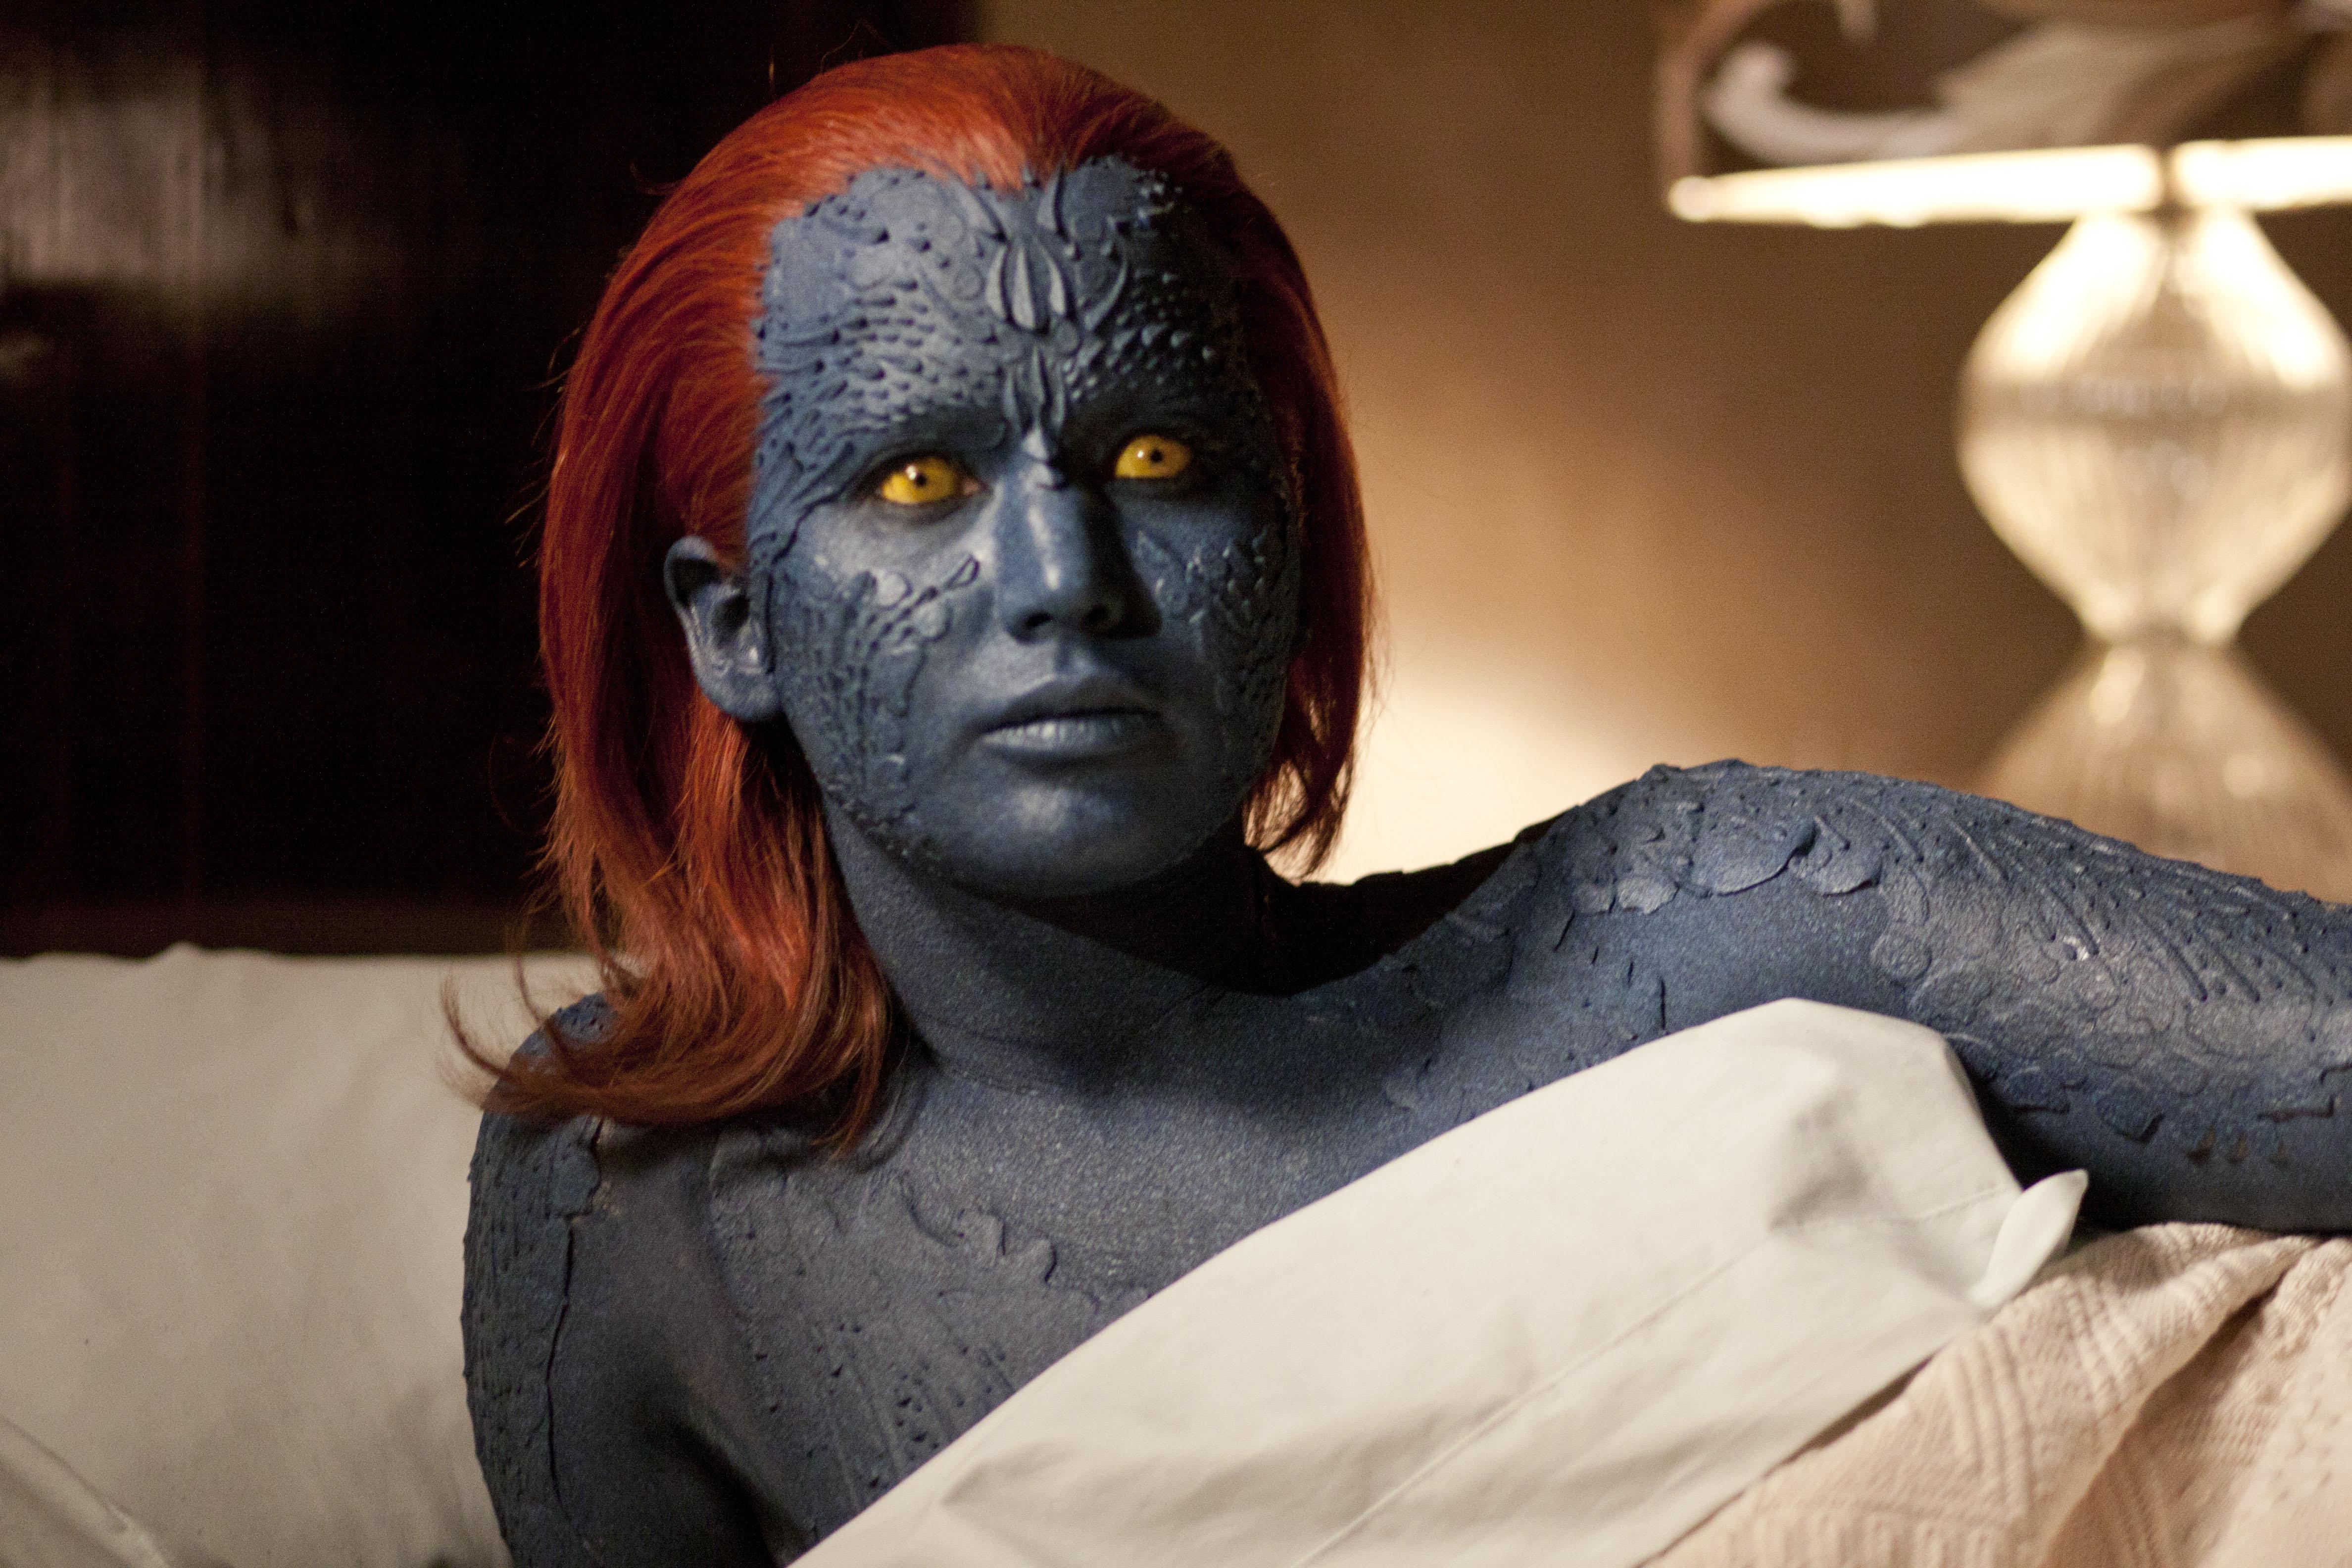 Jennifer Lawrence as Mystique in 'X-Men: First Class'